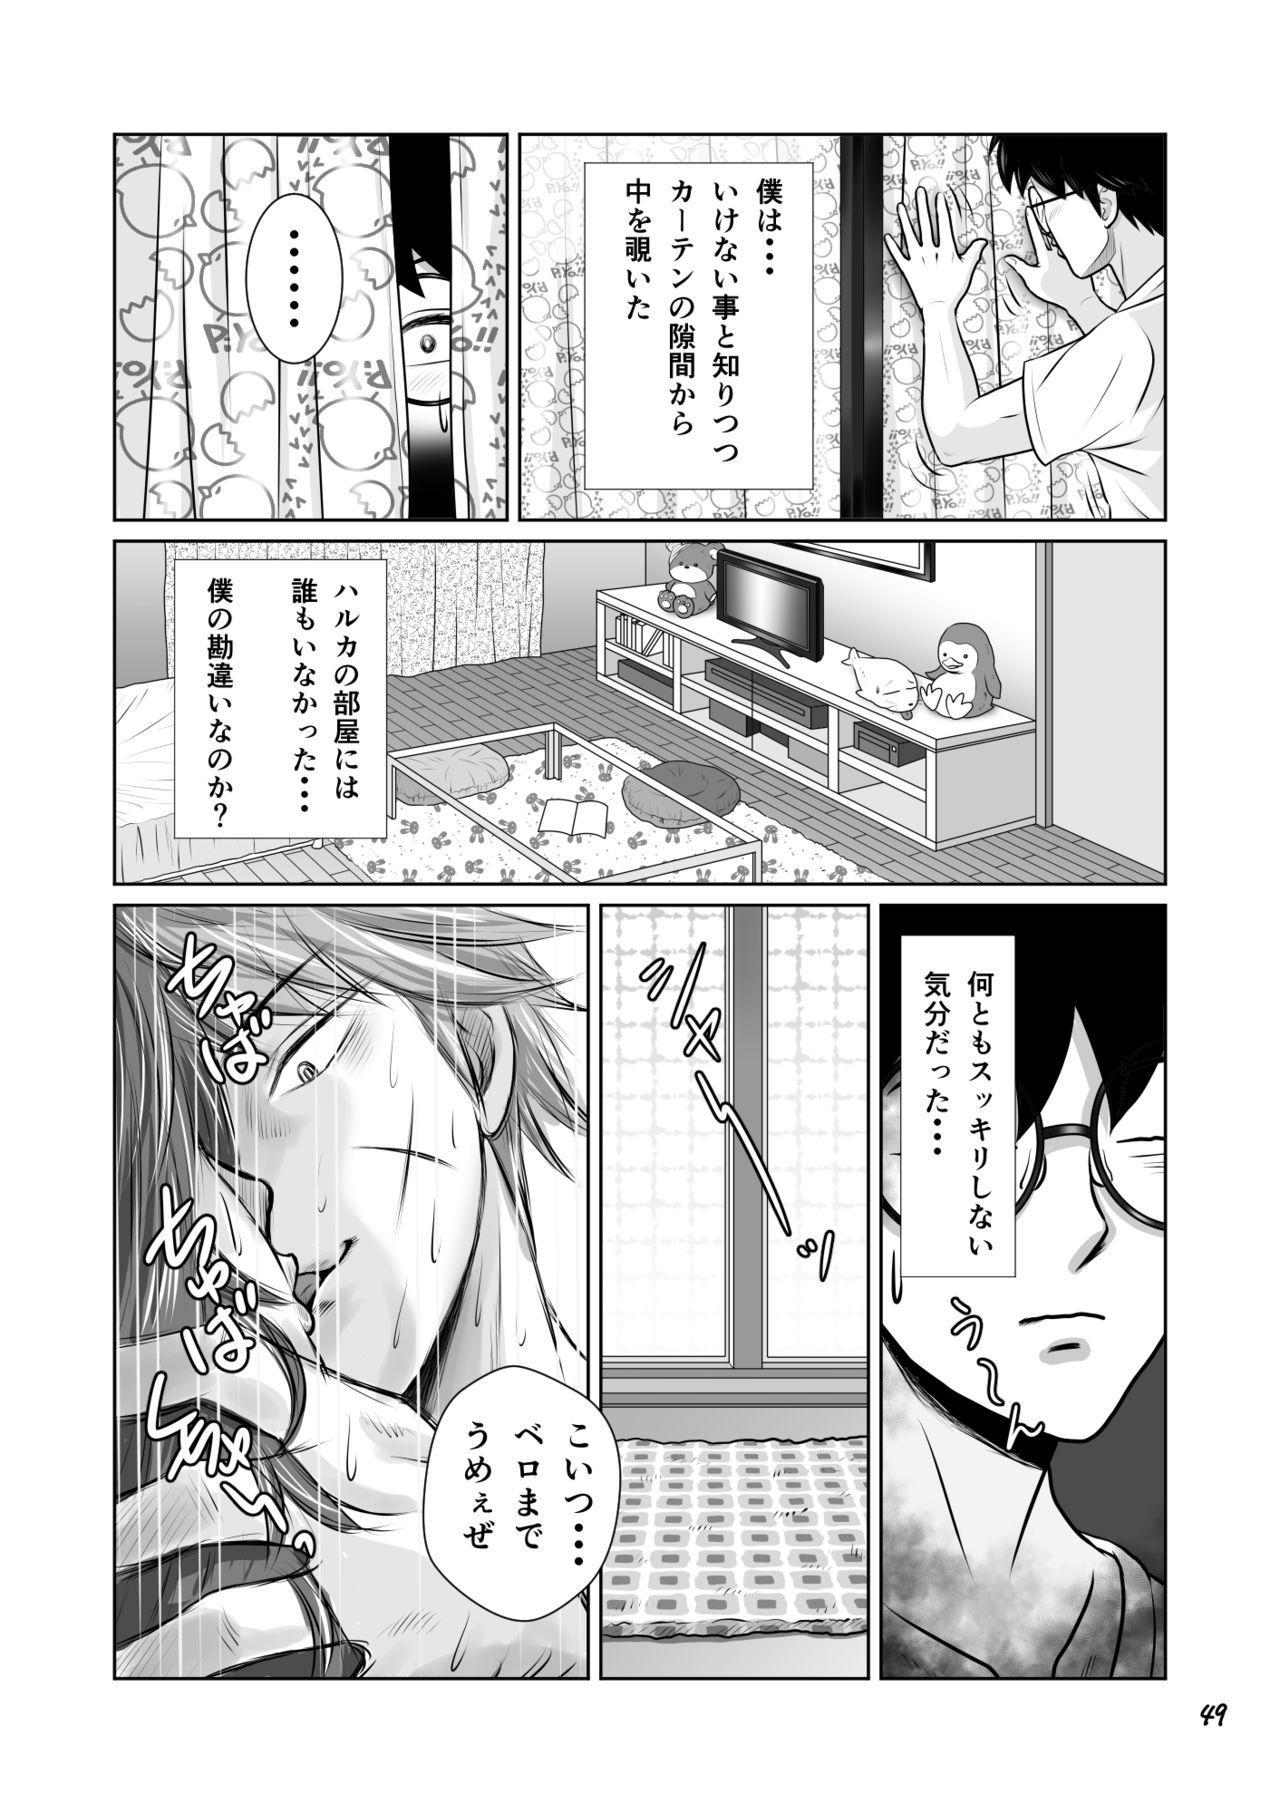 Netorare Osananajimi Haruka-chan Kiki Ippatsu!! 49